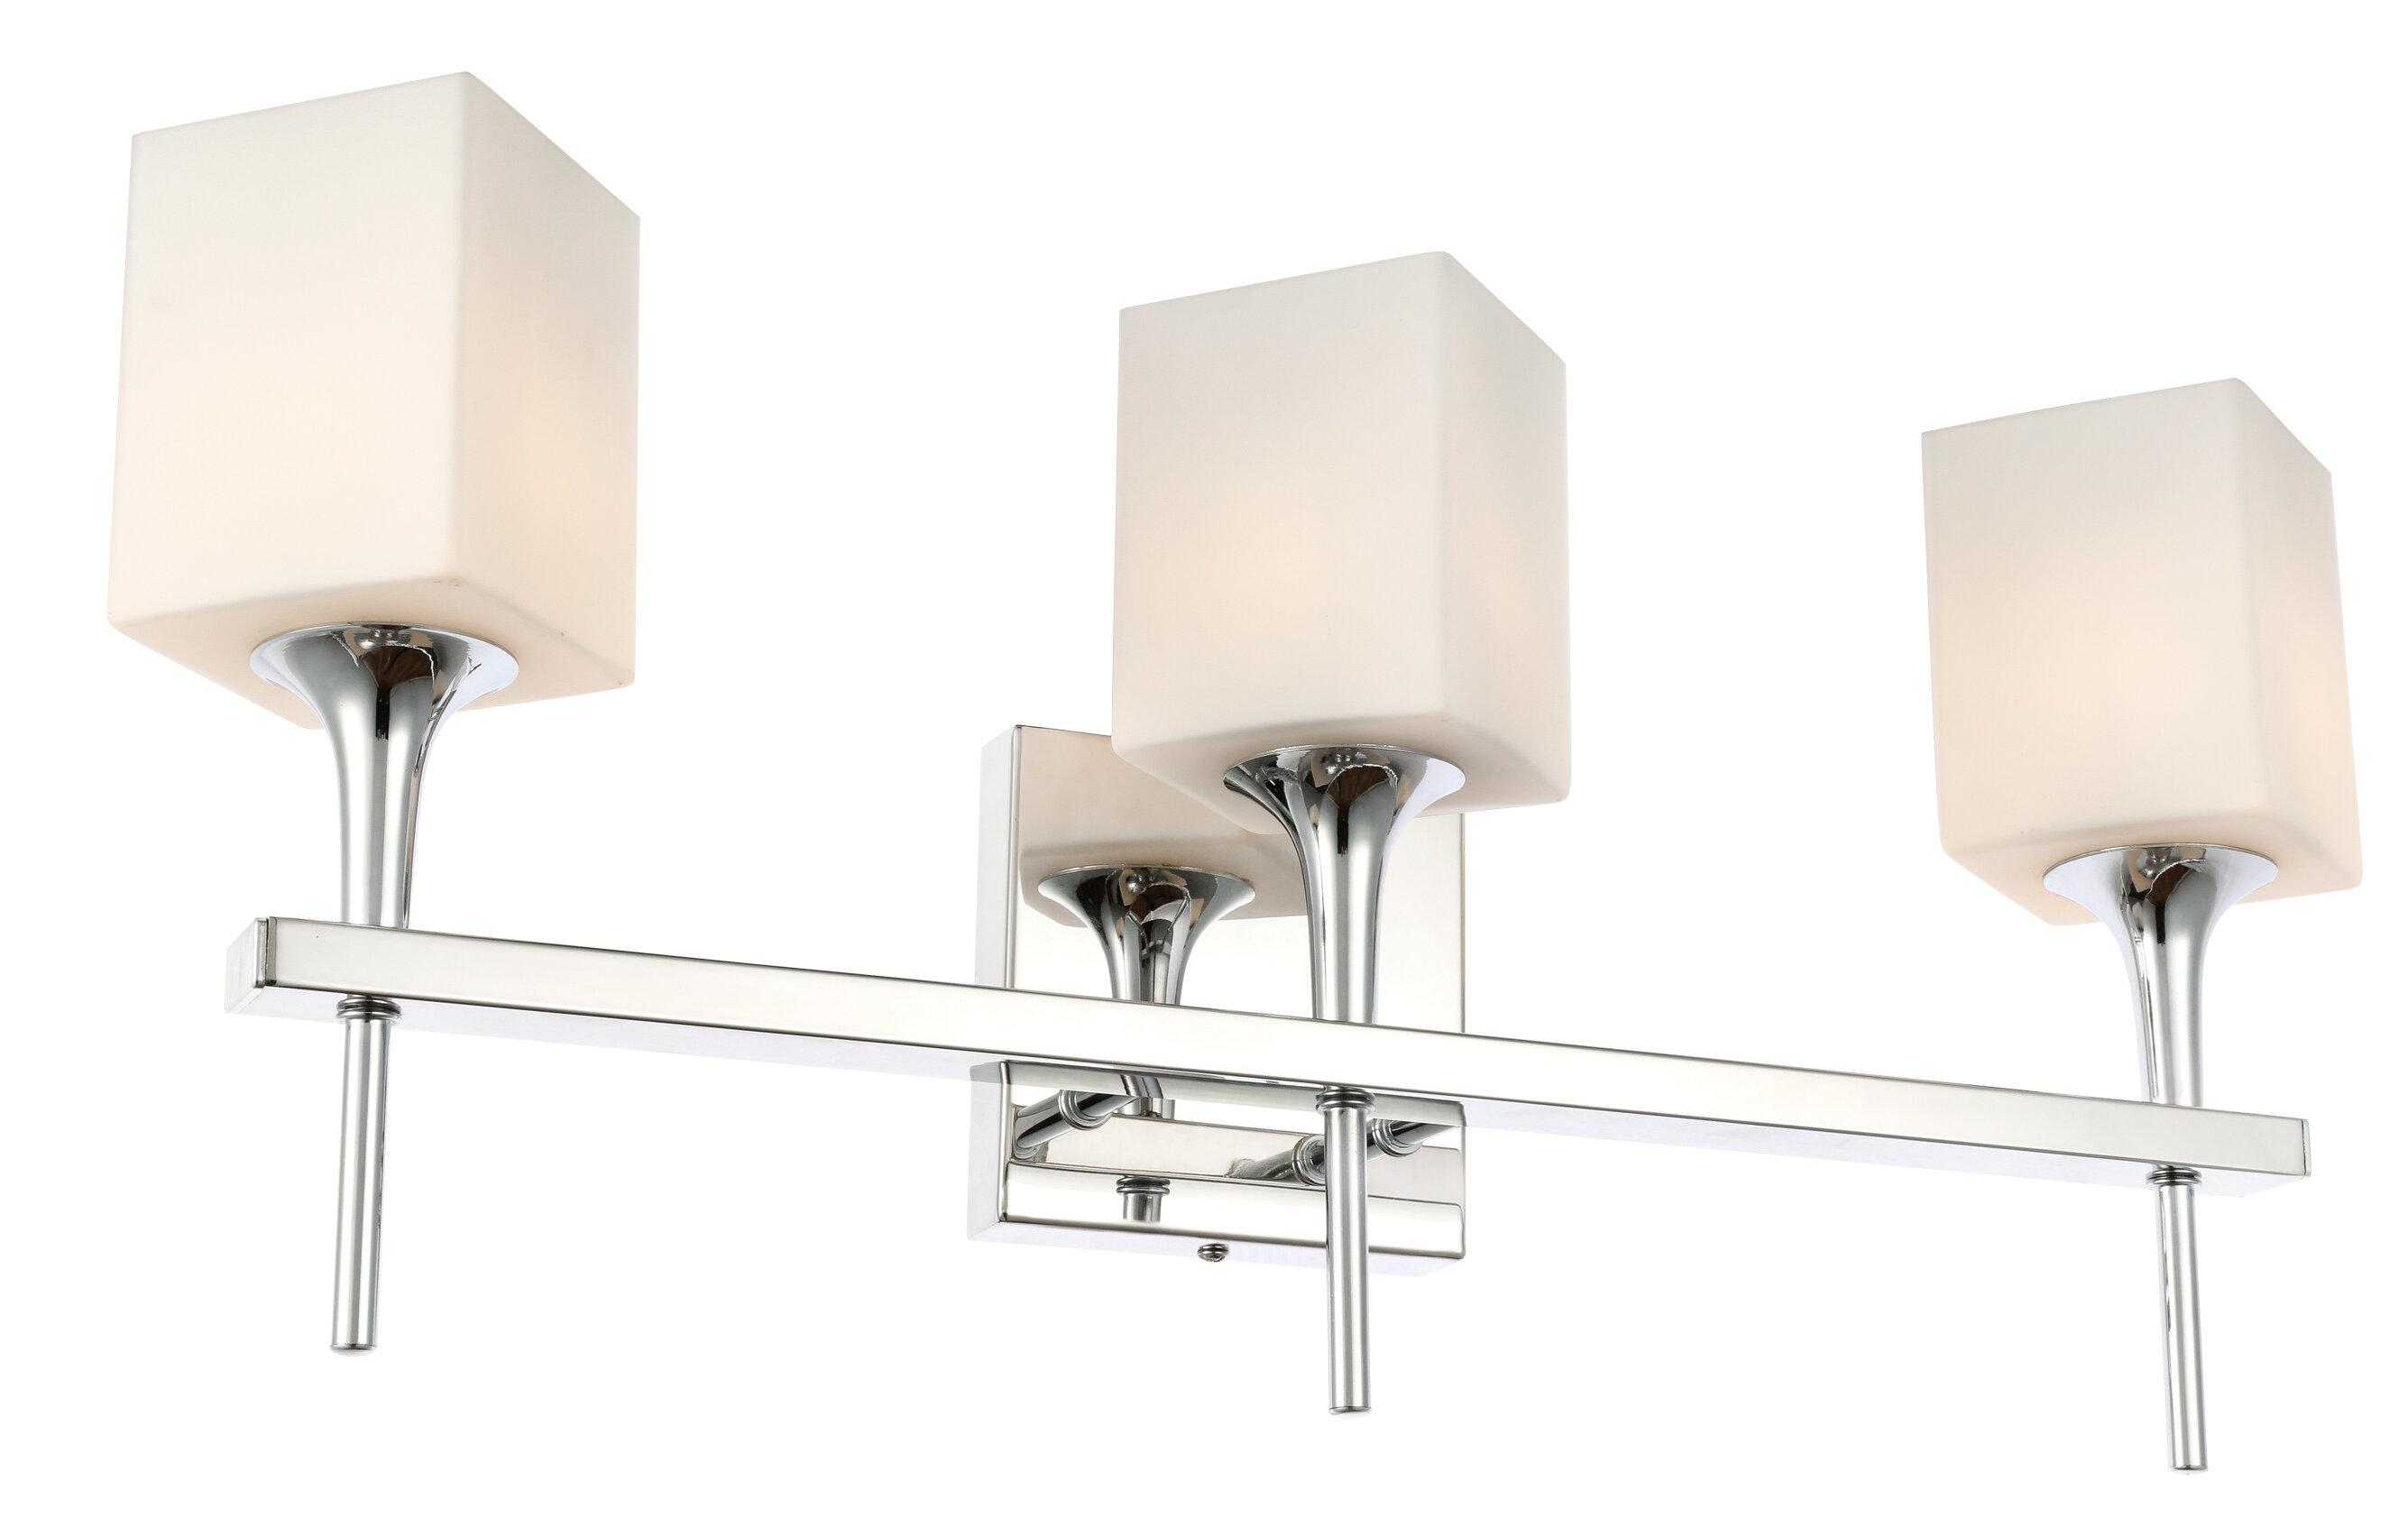 Ebern Designs Shults Opal Square Glass 3 Light Vanity Light Wayfair